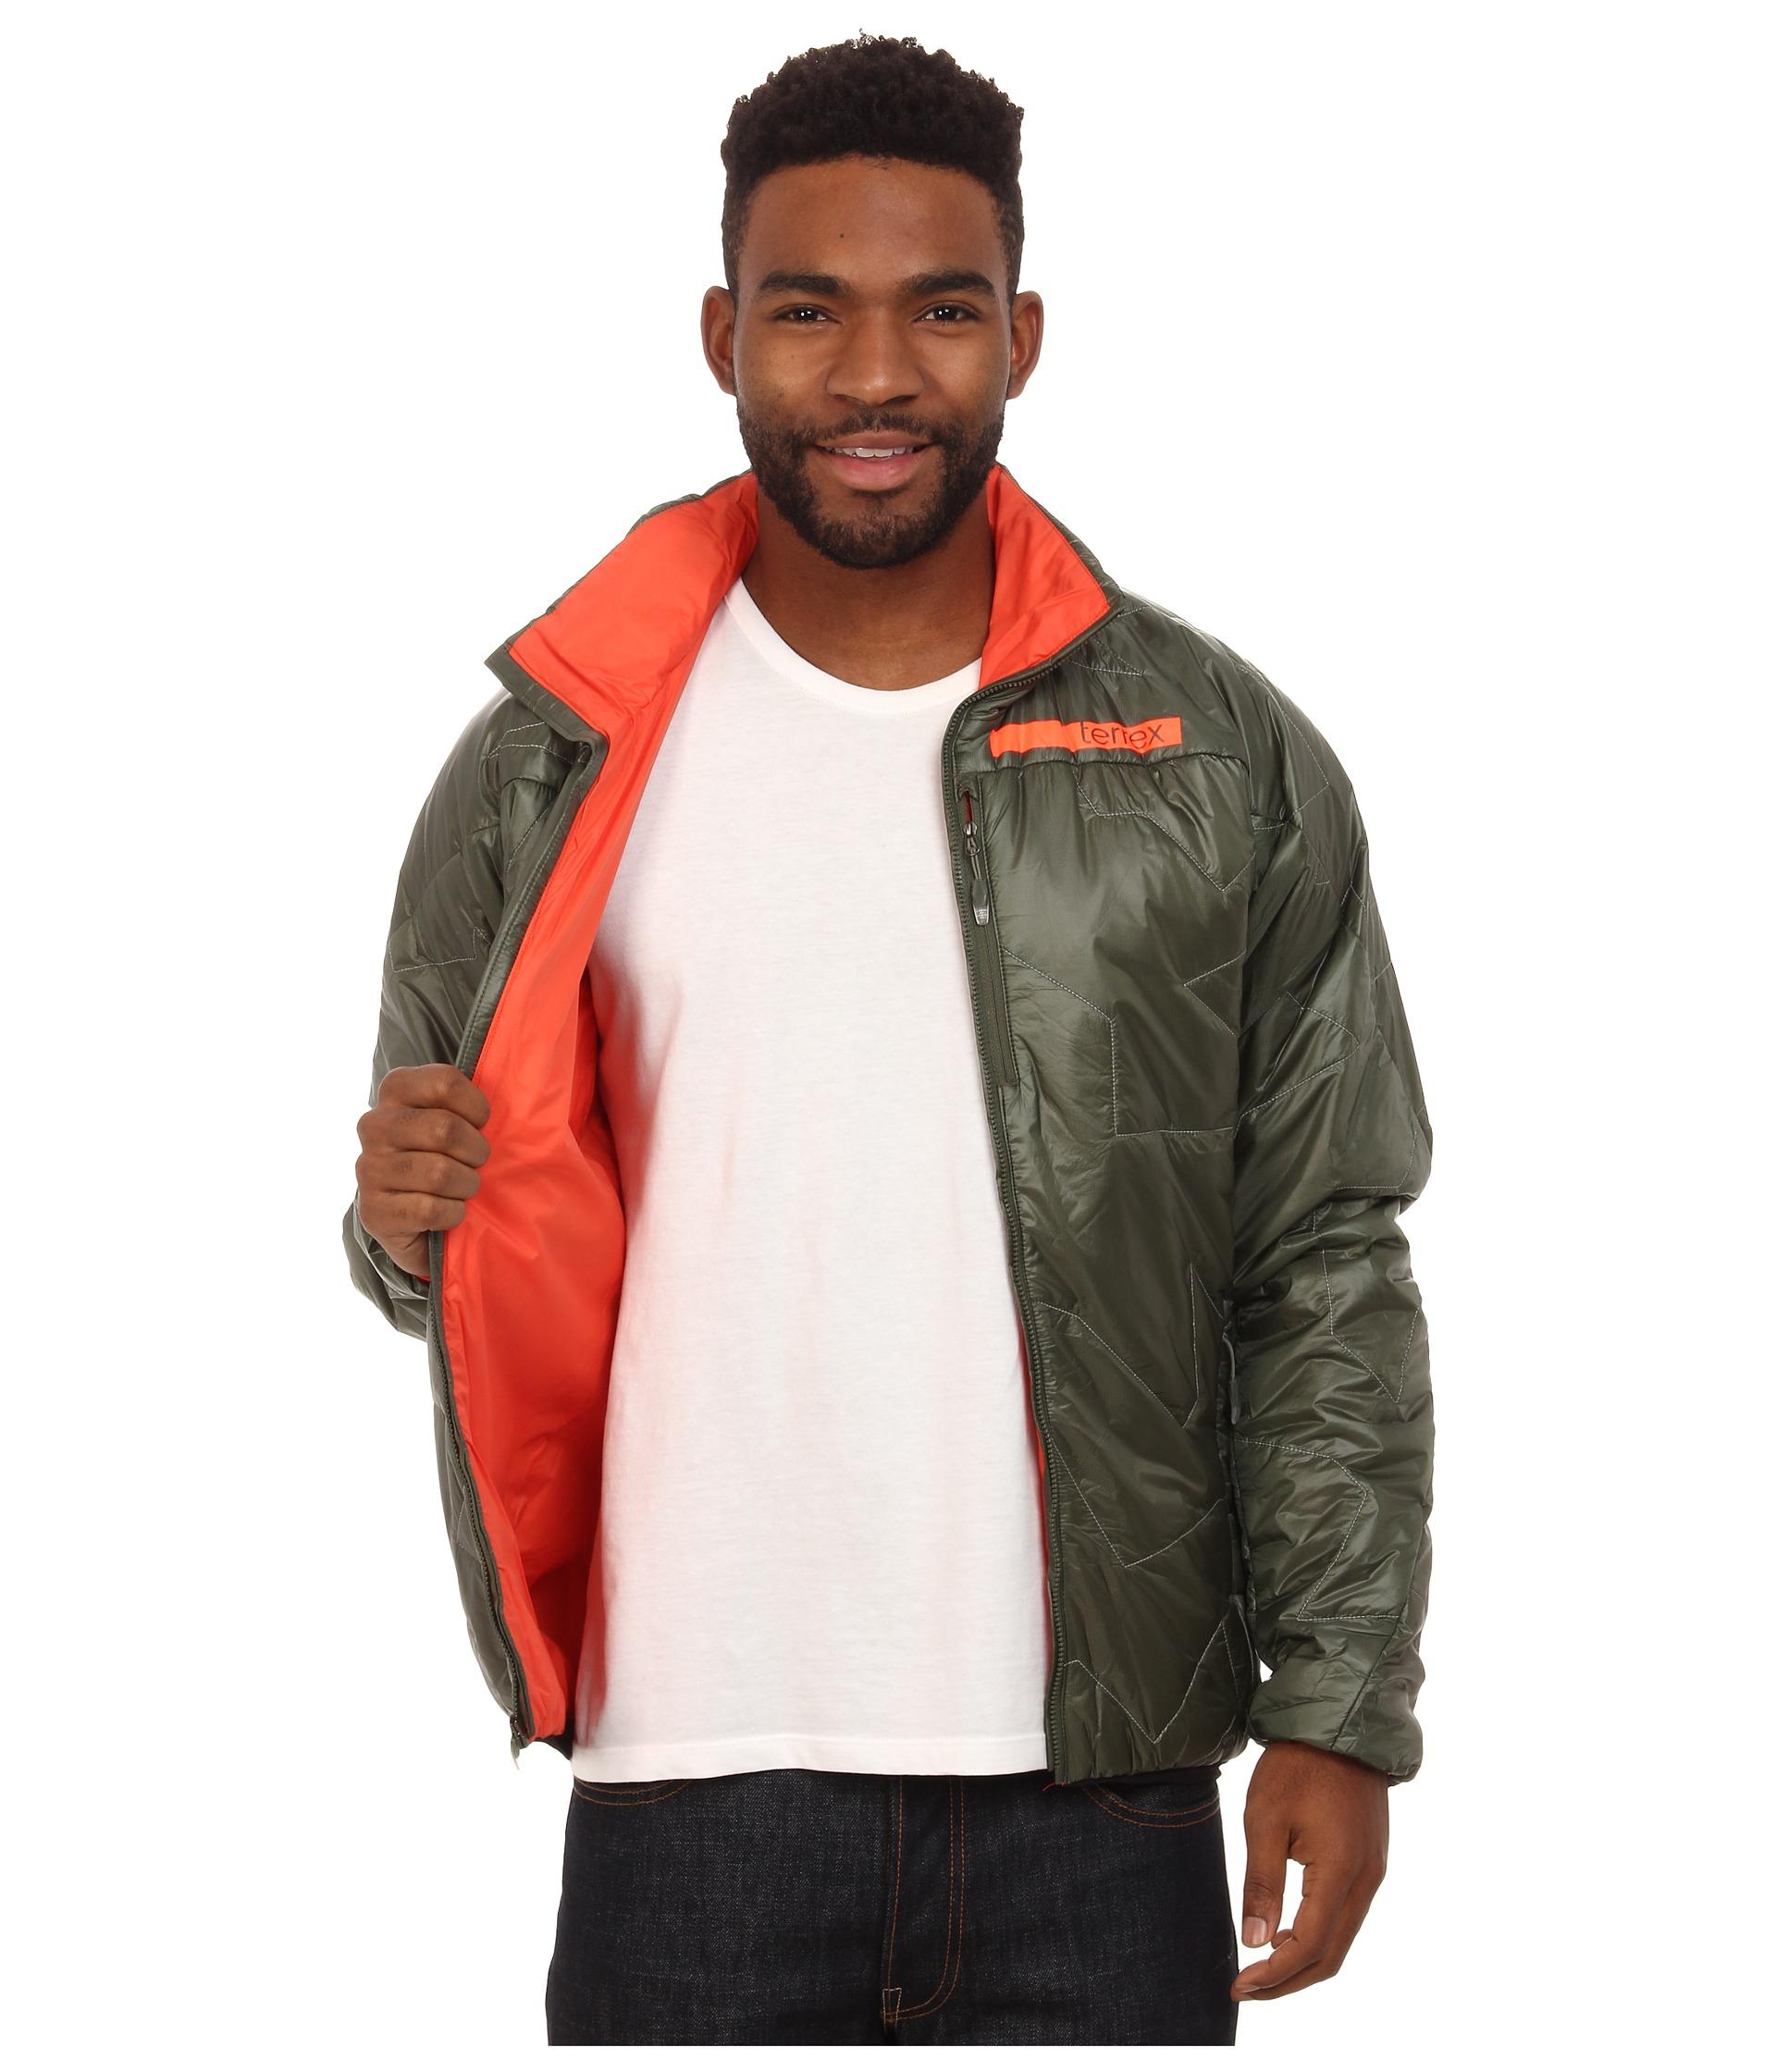 8c1a2f7c7ff3 Lyst - adidas Terrex Agravic Primaloft Jacket in Green for Men